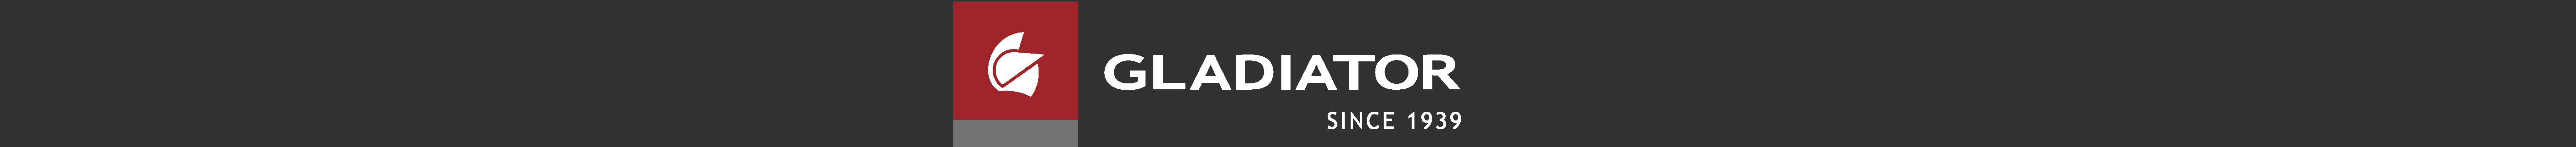 Maletas Gladiator